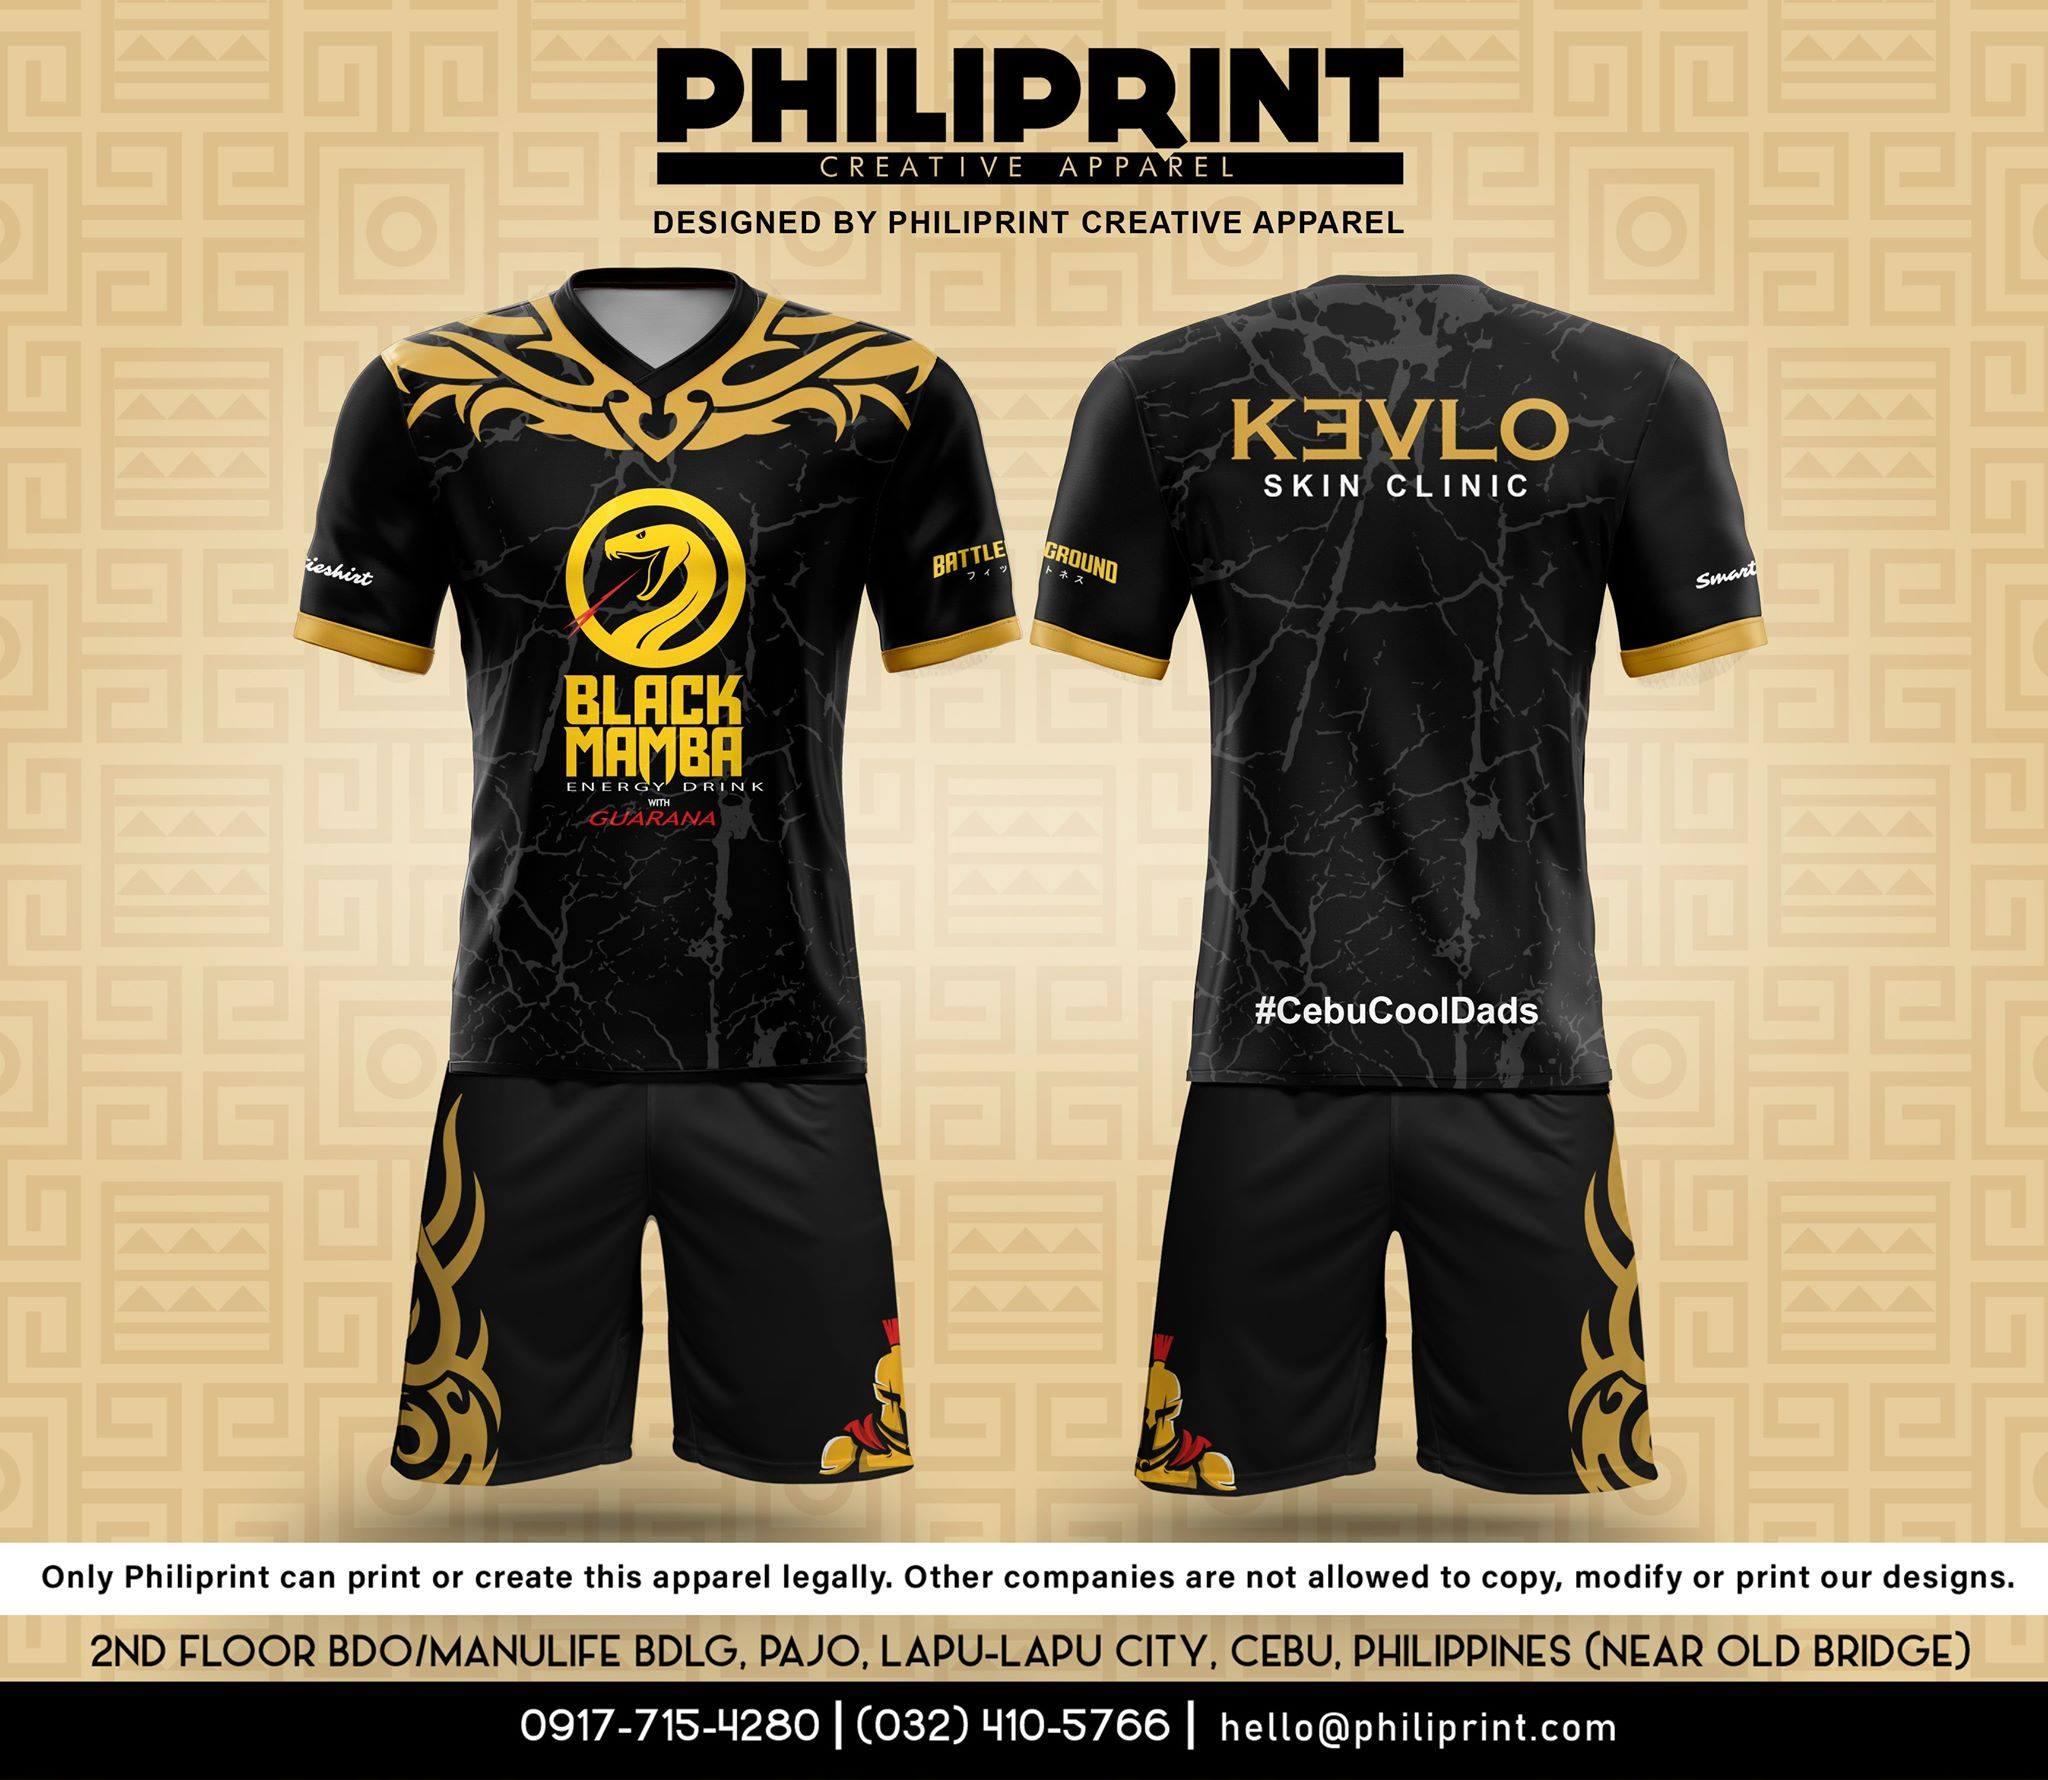 Philiprint Football Jersey Full Sublimation BLACK MAMBA KEVLO SKIN CLINIC